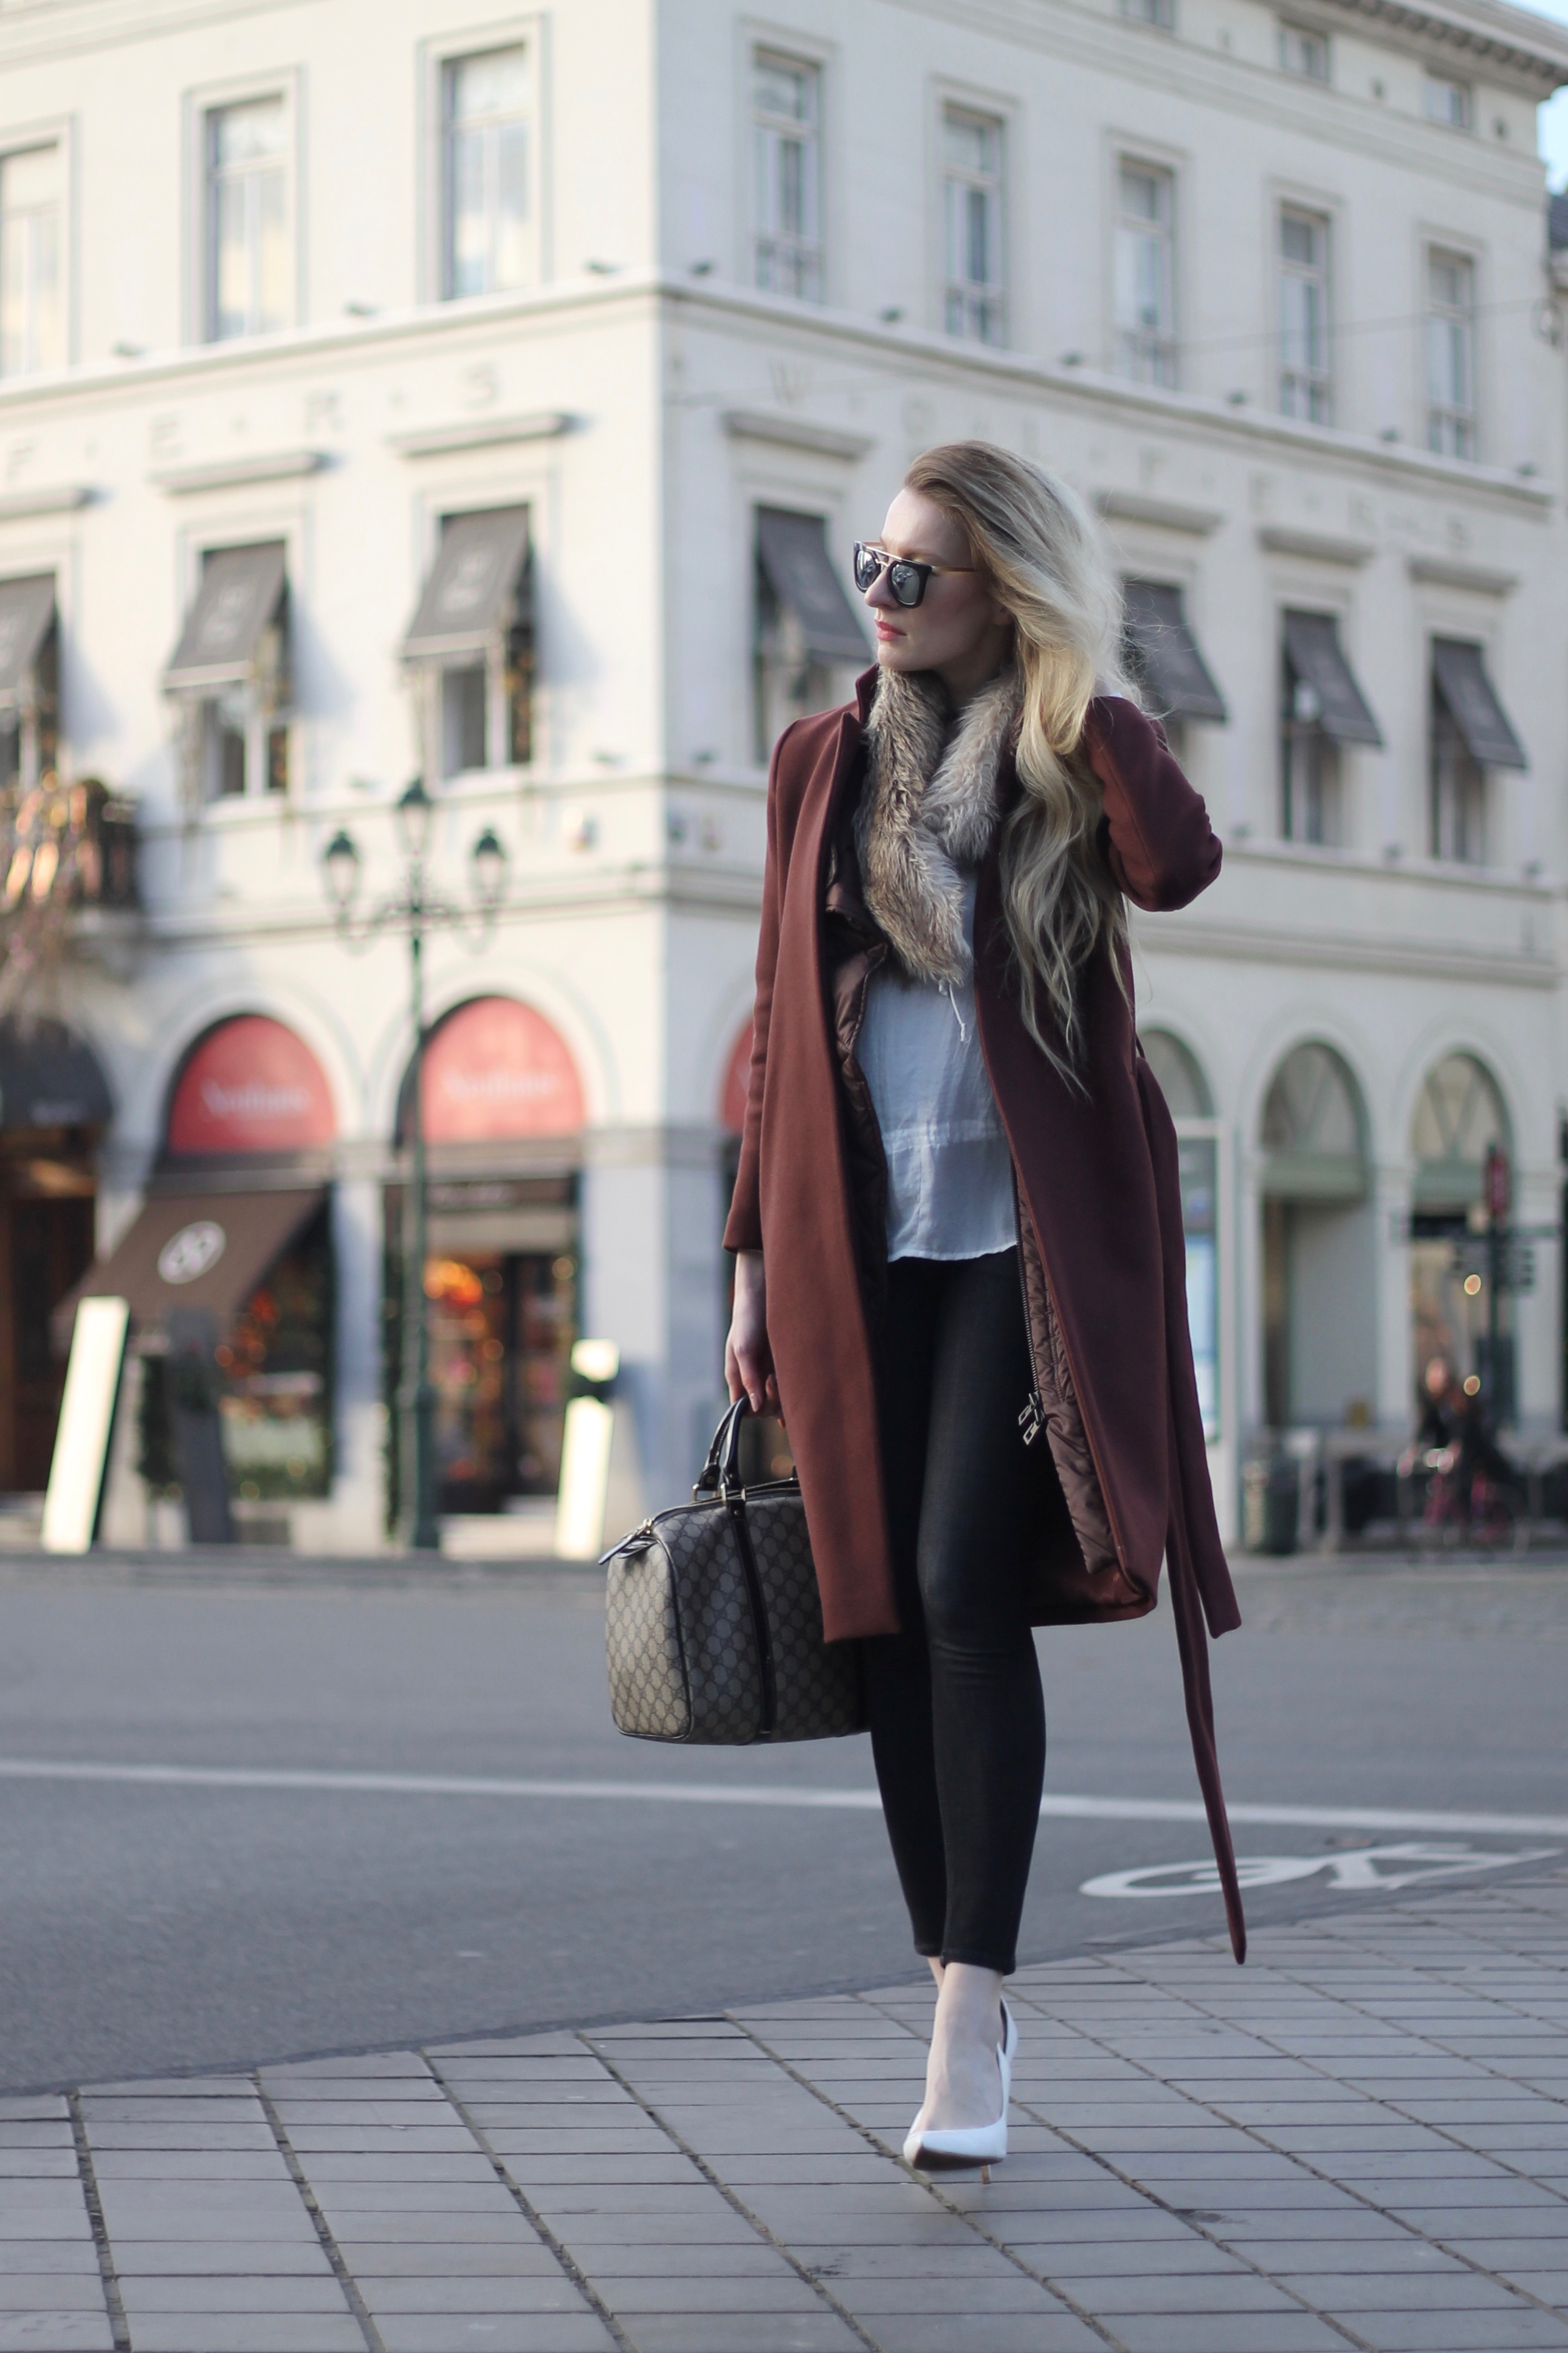 MON MODE | Fashion Blogger | Berlin Street Style | Fashion Trends | Berlin Fashion| Brussels| Travel Blogger| Belgium Brussels